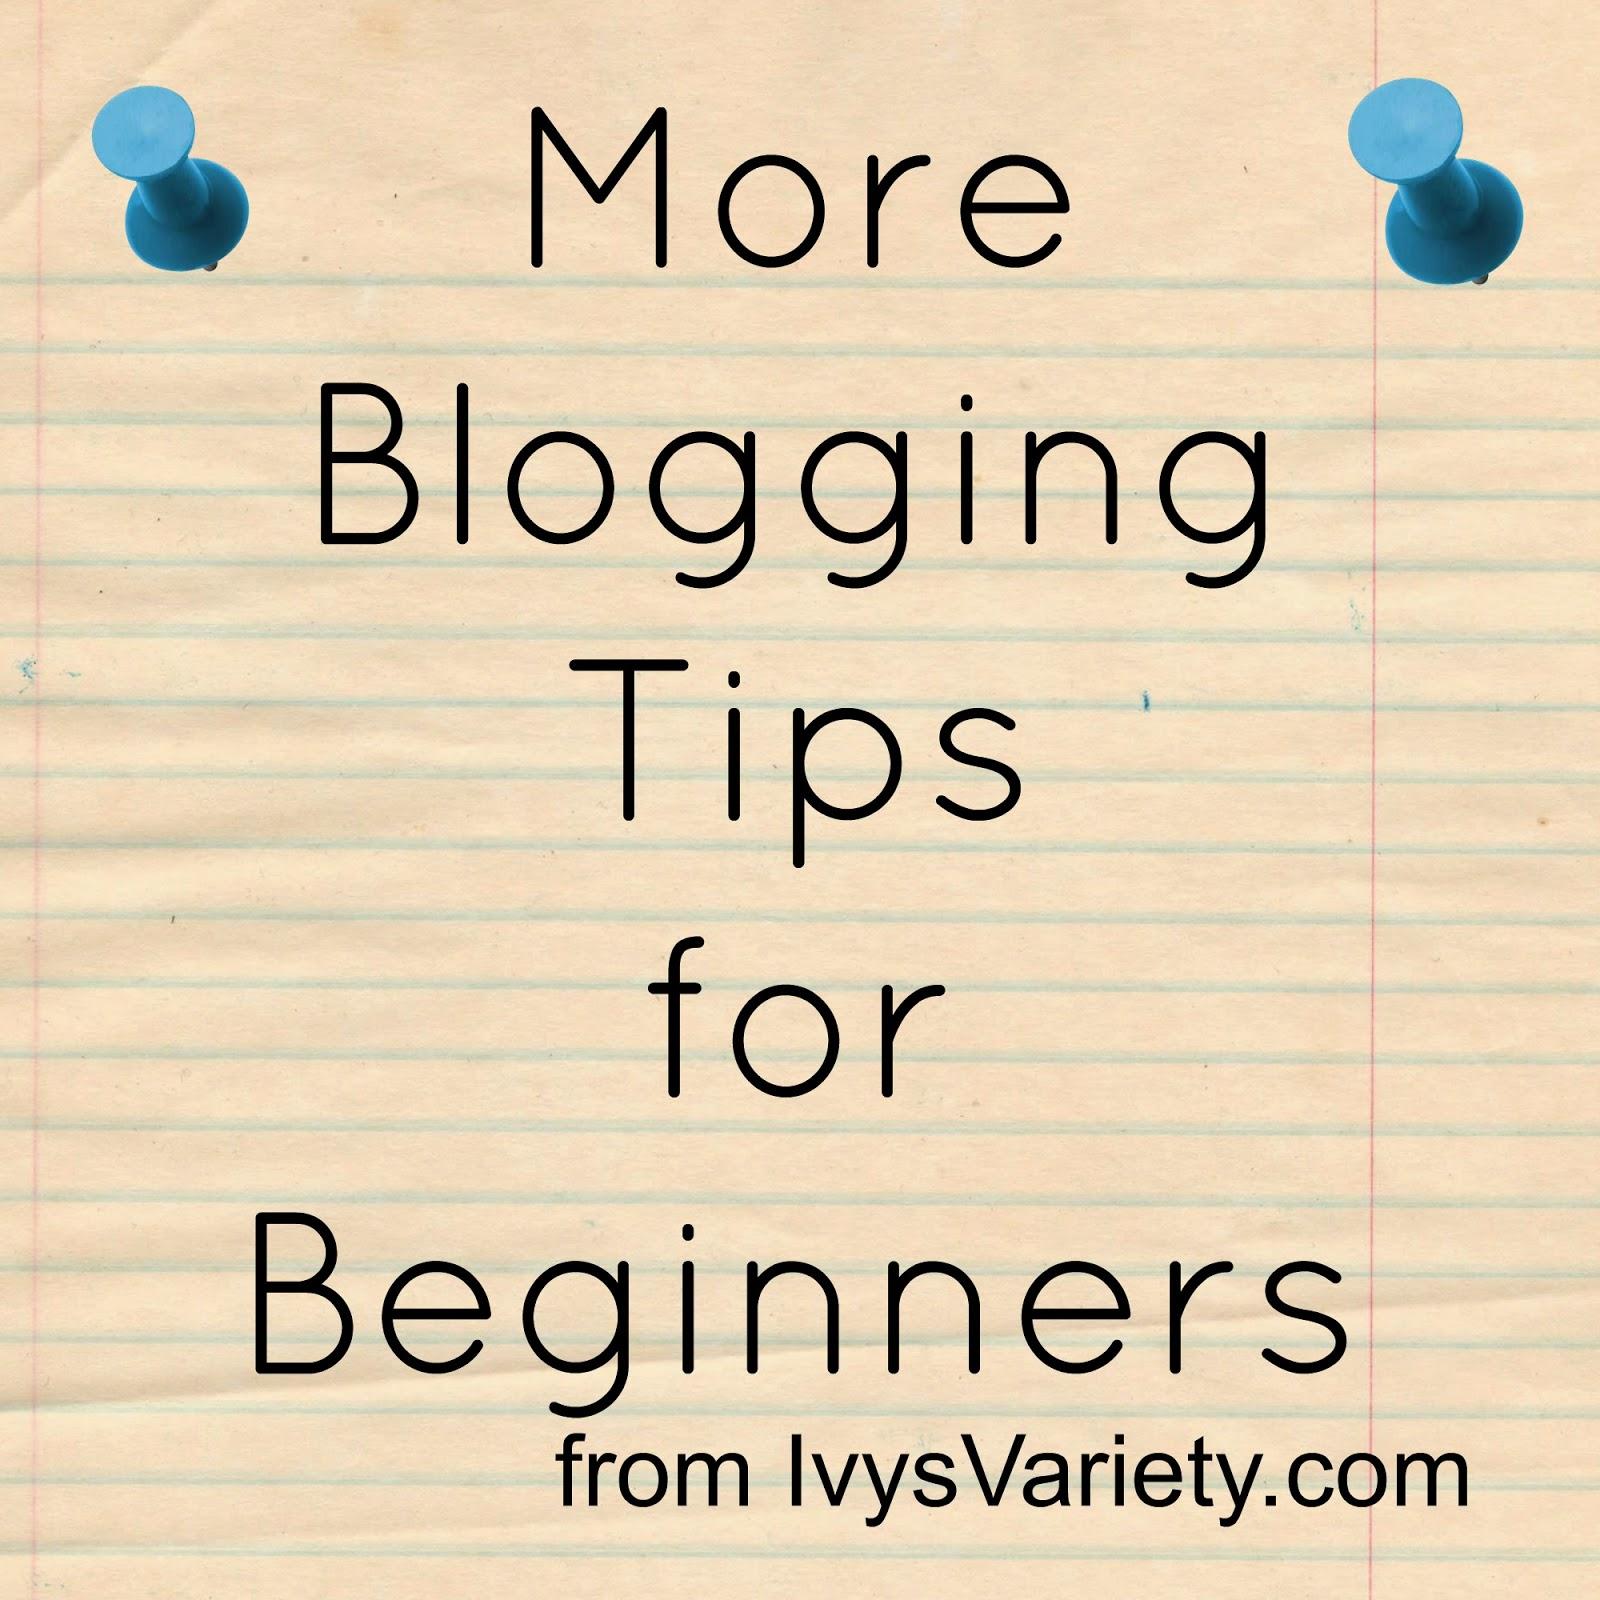 More beginner blogging tips